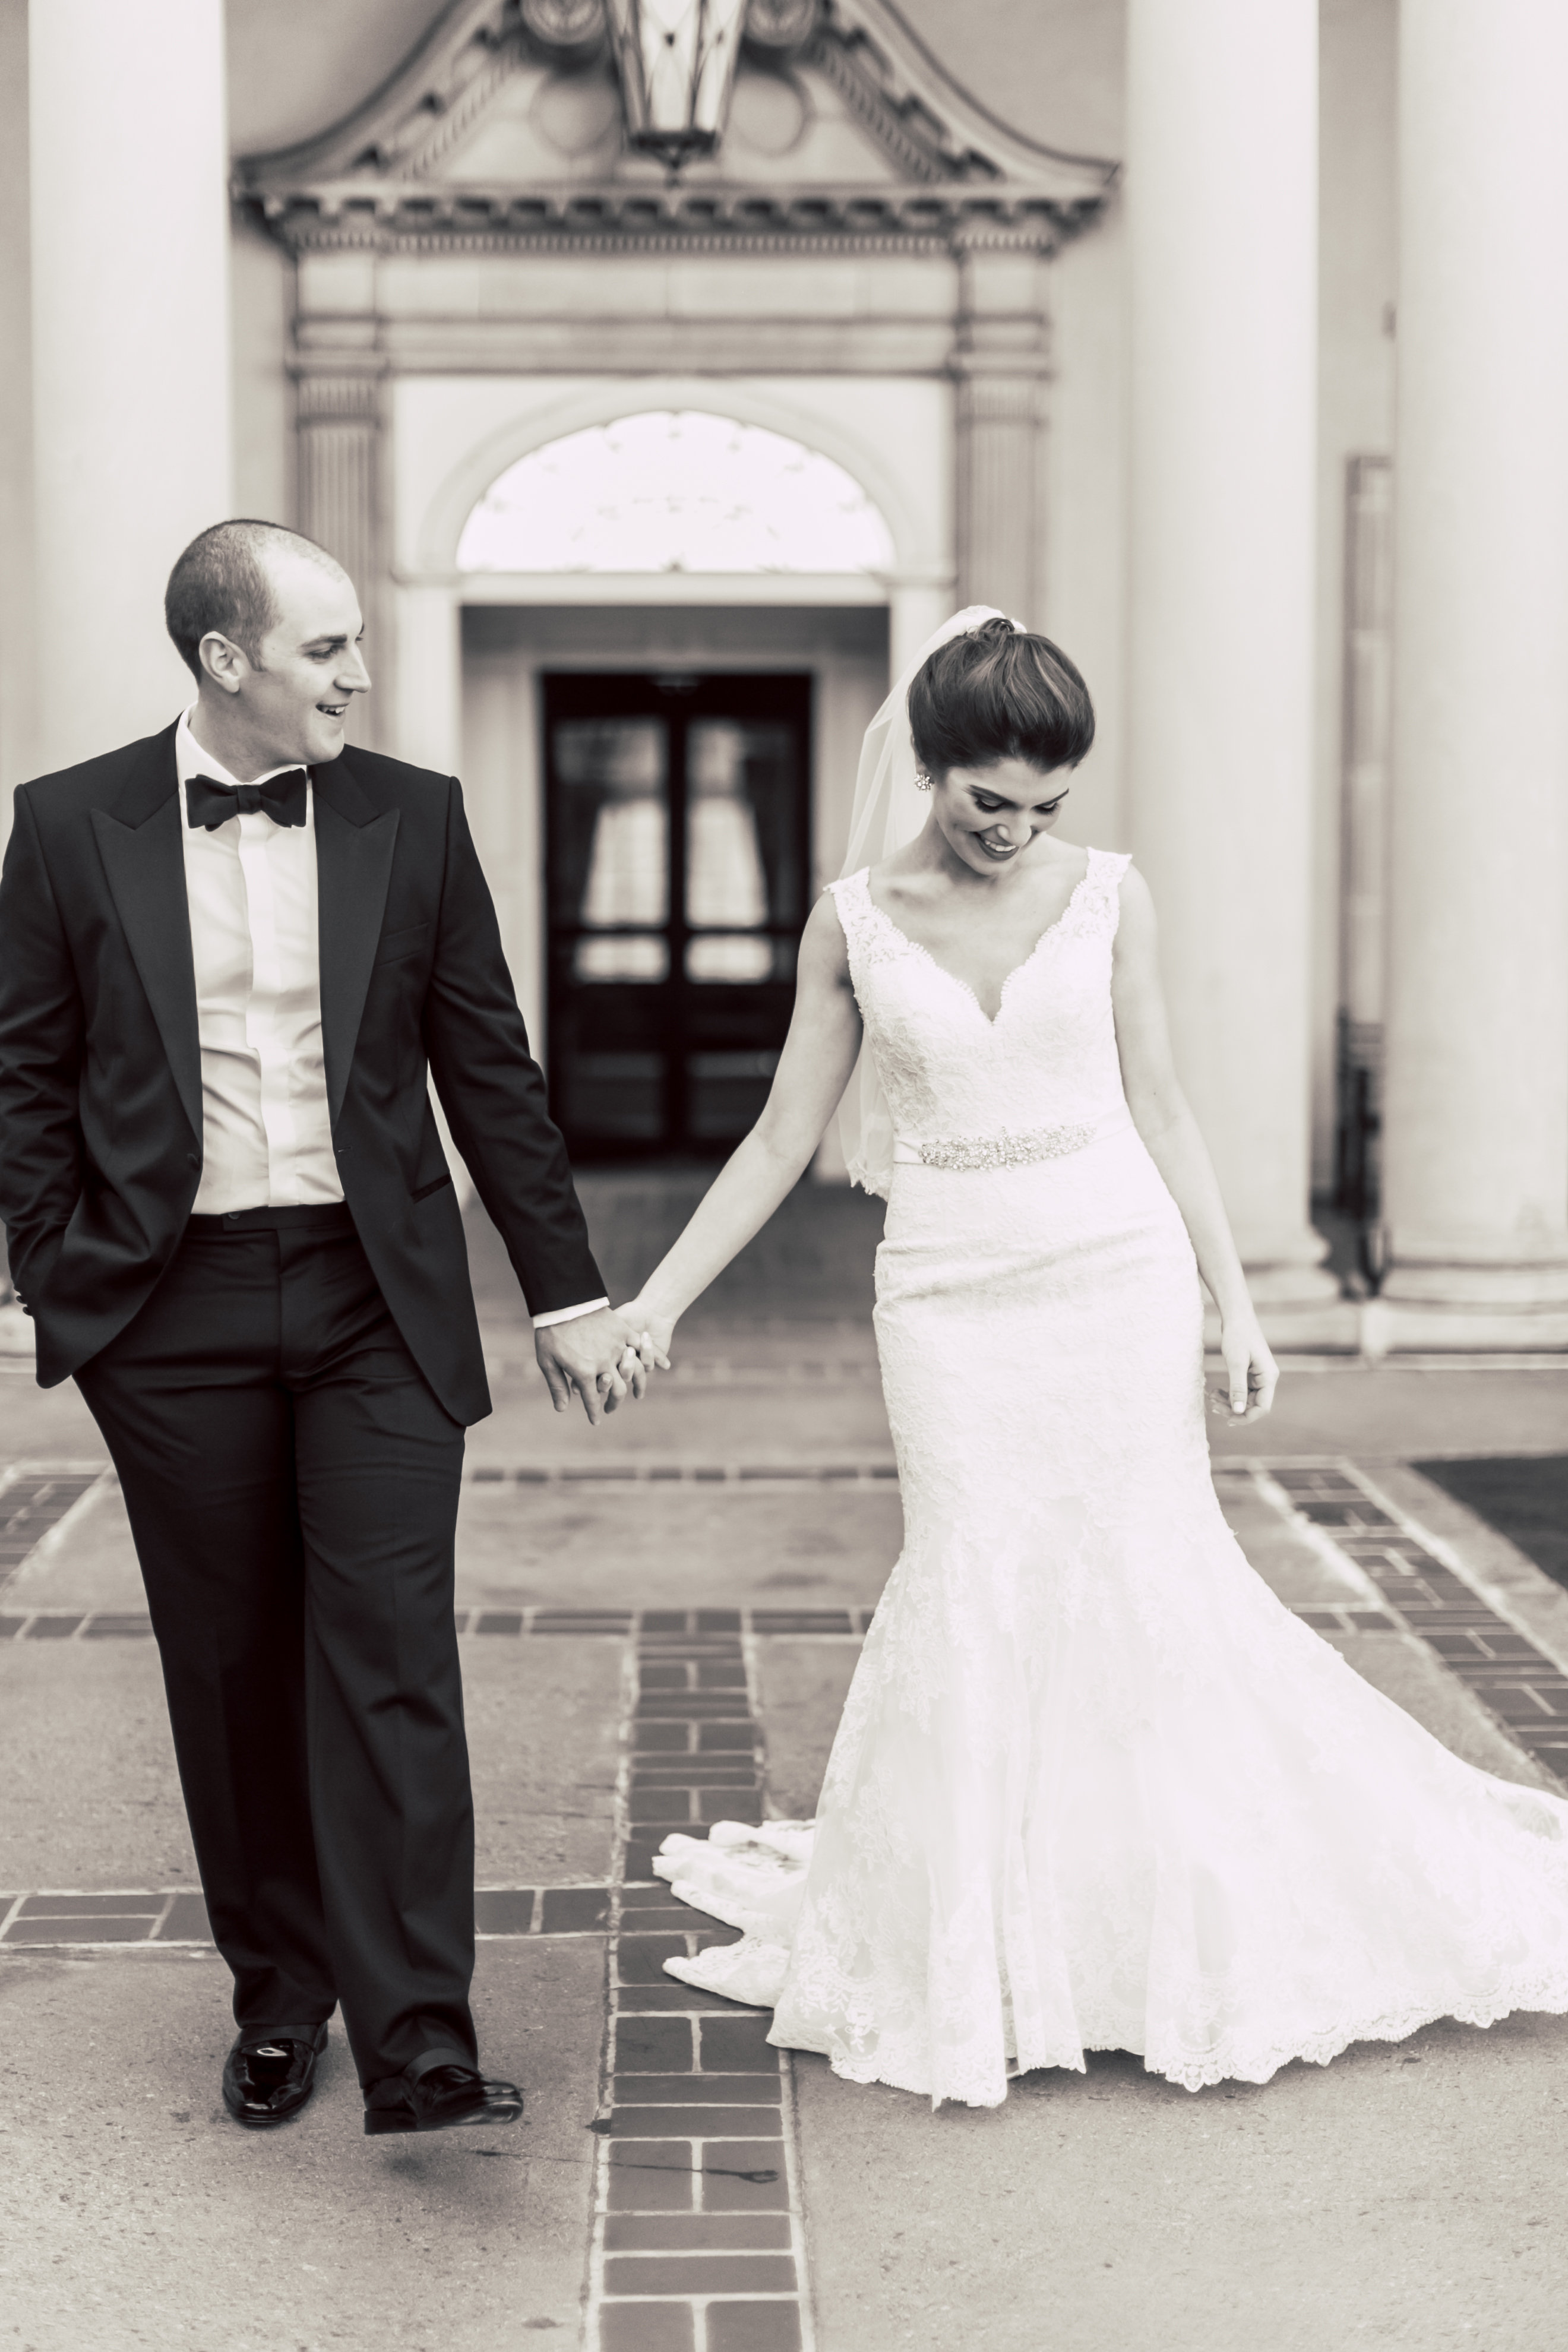 Atlanta Ballroom Wedding at The Biltmore Ballrooms; Atlanta Certified Wedding Planner; Atlanta Wedding Coordinator